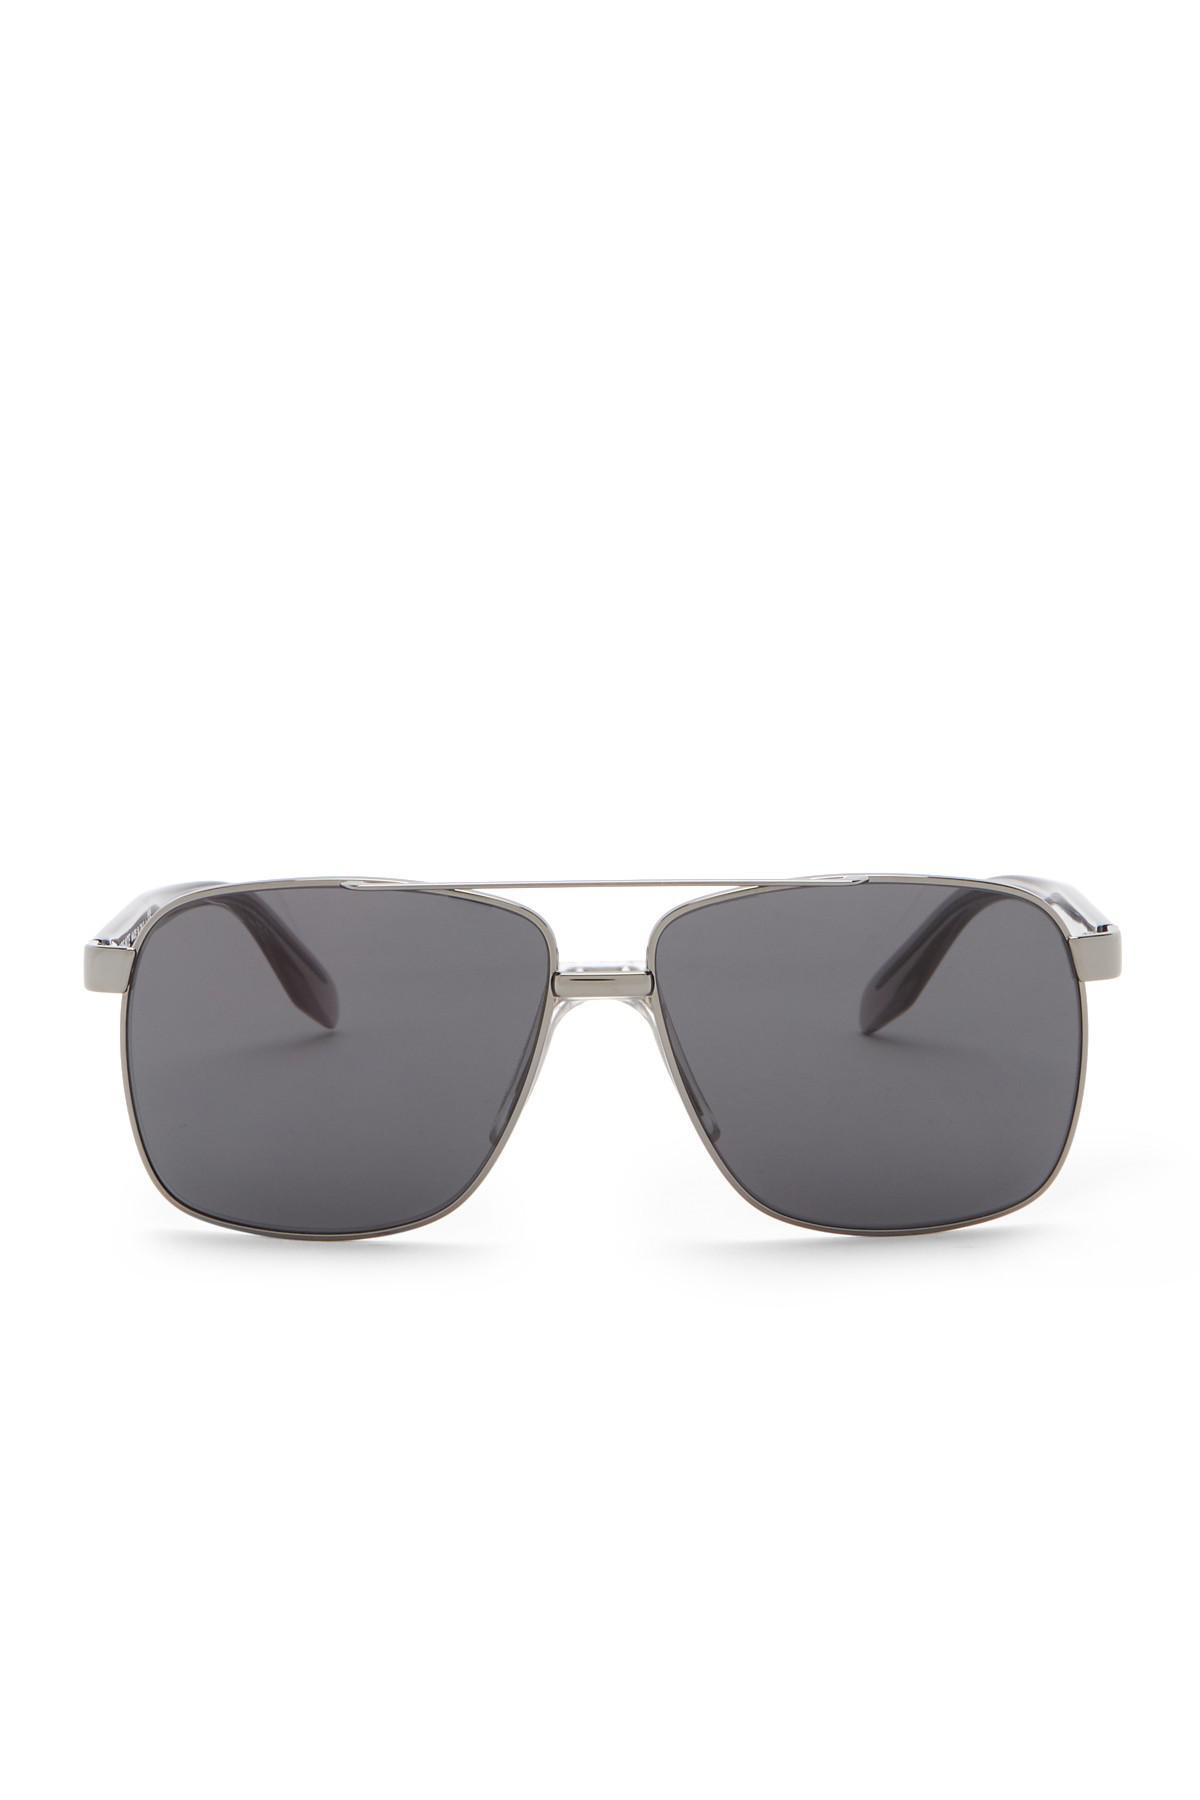 eb750a80fbeb Versace - Gray 59mm Square Sunglasses for Men - Lyst. View fullscreen